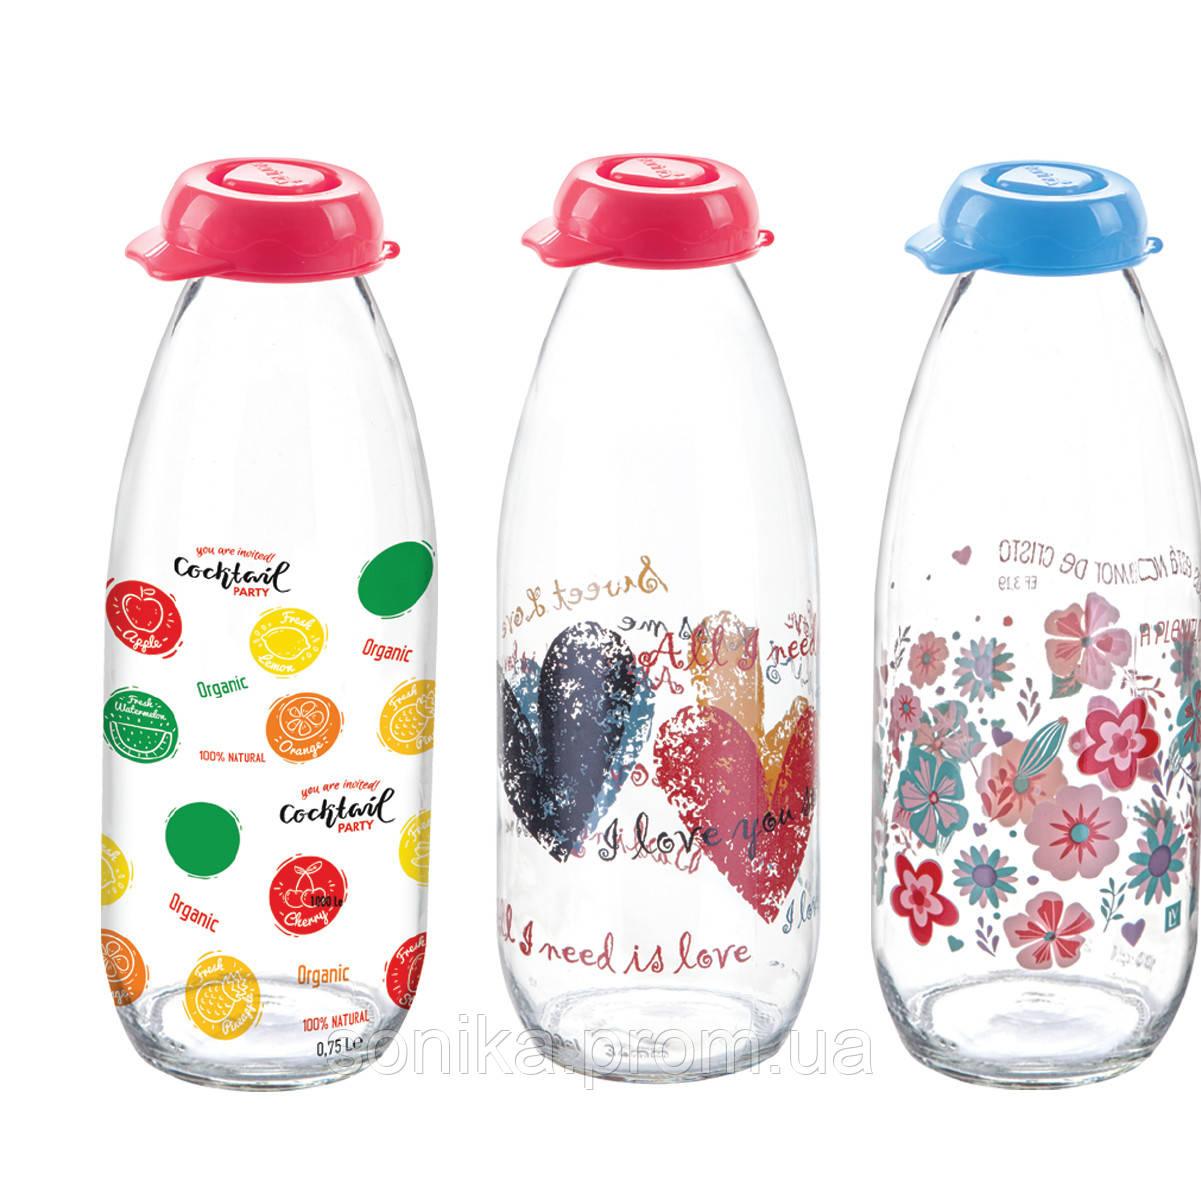 Пляшка для напоїв Sarina 500 мл S-761